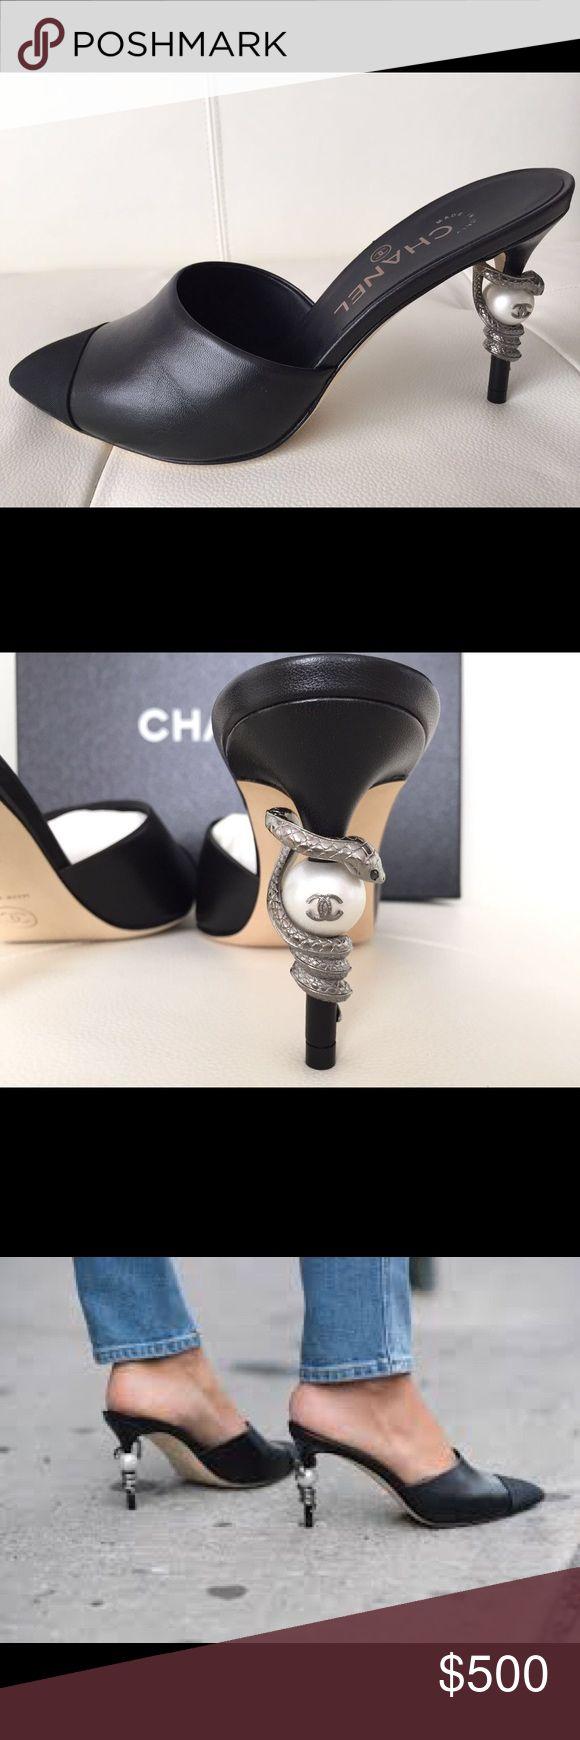 Chanel black heels size 6.5 us , 38 EU Great condition ,Chanel black heels. store price is 1200.  Chanel size is 6.5 which is 38 EU. CHANEL Shoes Heels